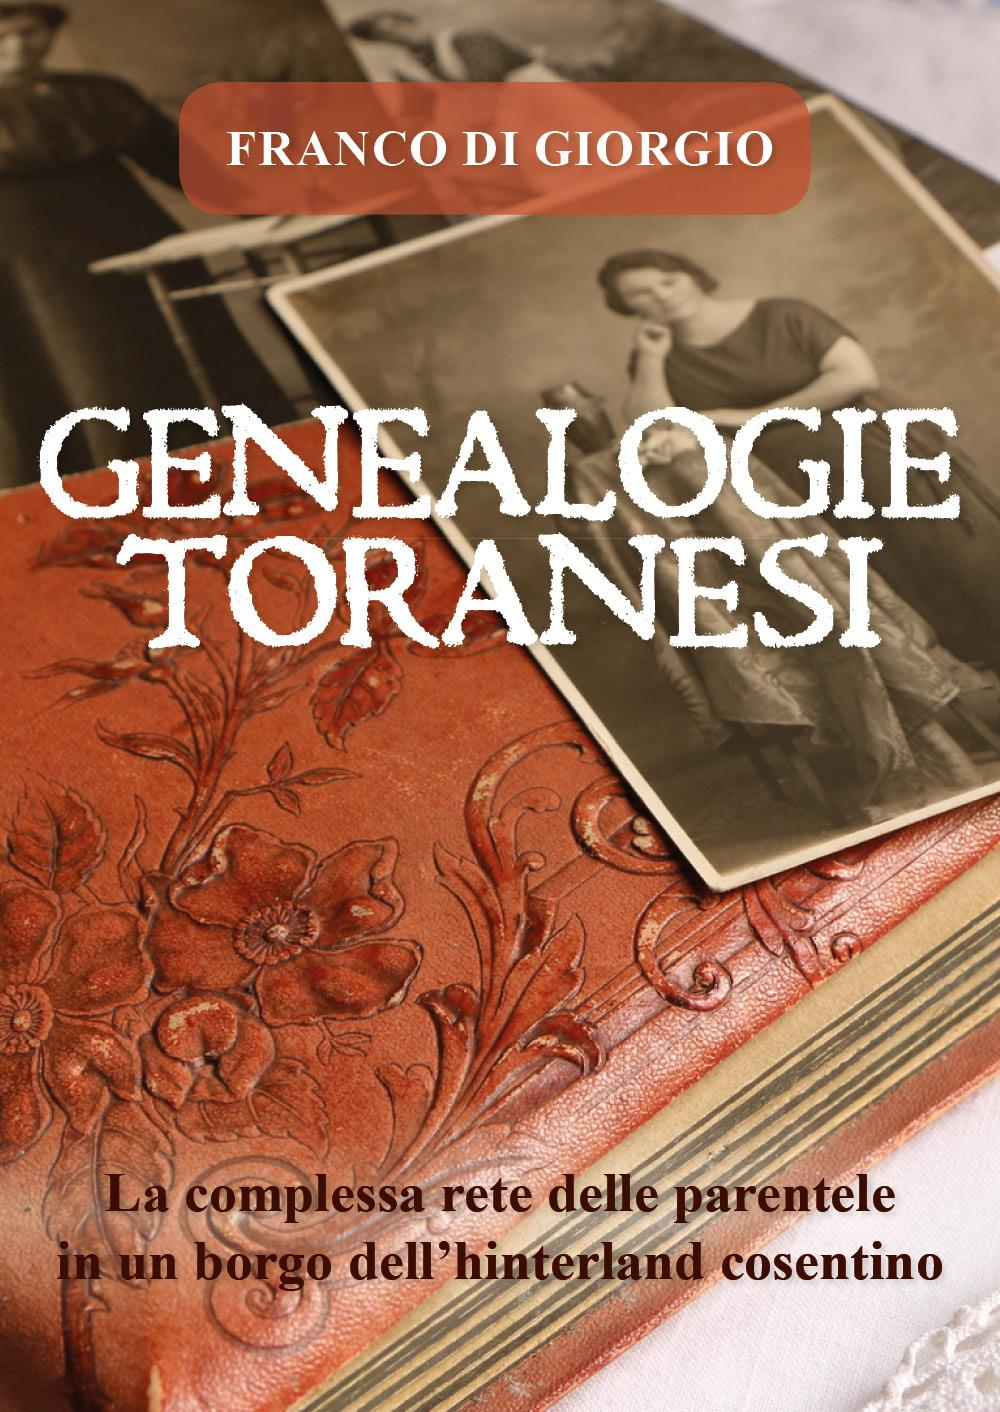 Genealogie toranesi